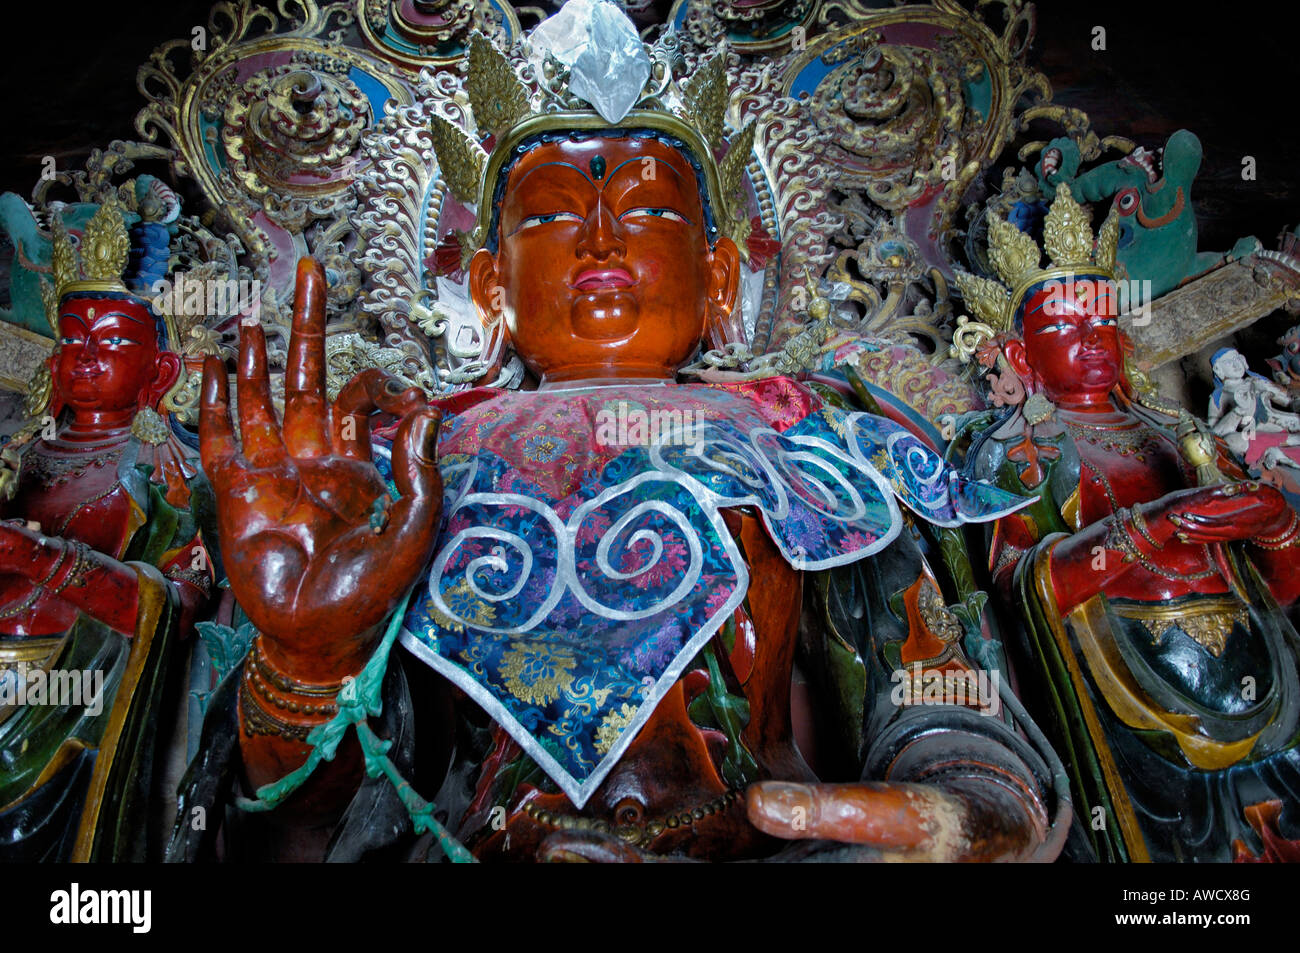 Buddha statue, Palcho Monastery or Pelkor Chode Monastery or Shekar Gyantse, Gyantse, Tibet - Stock Image